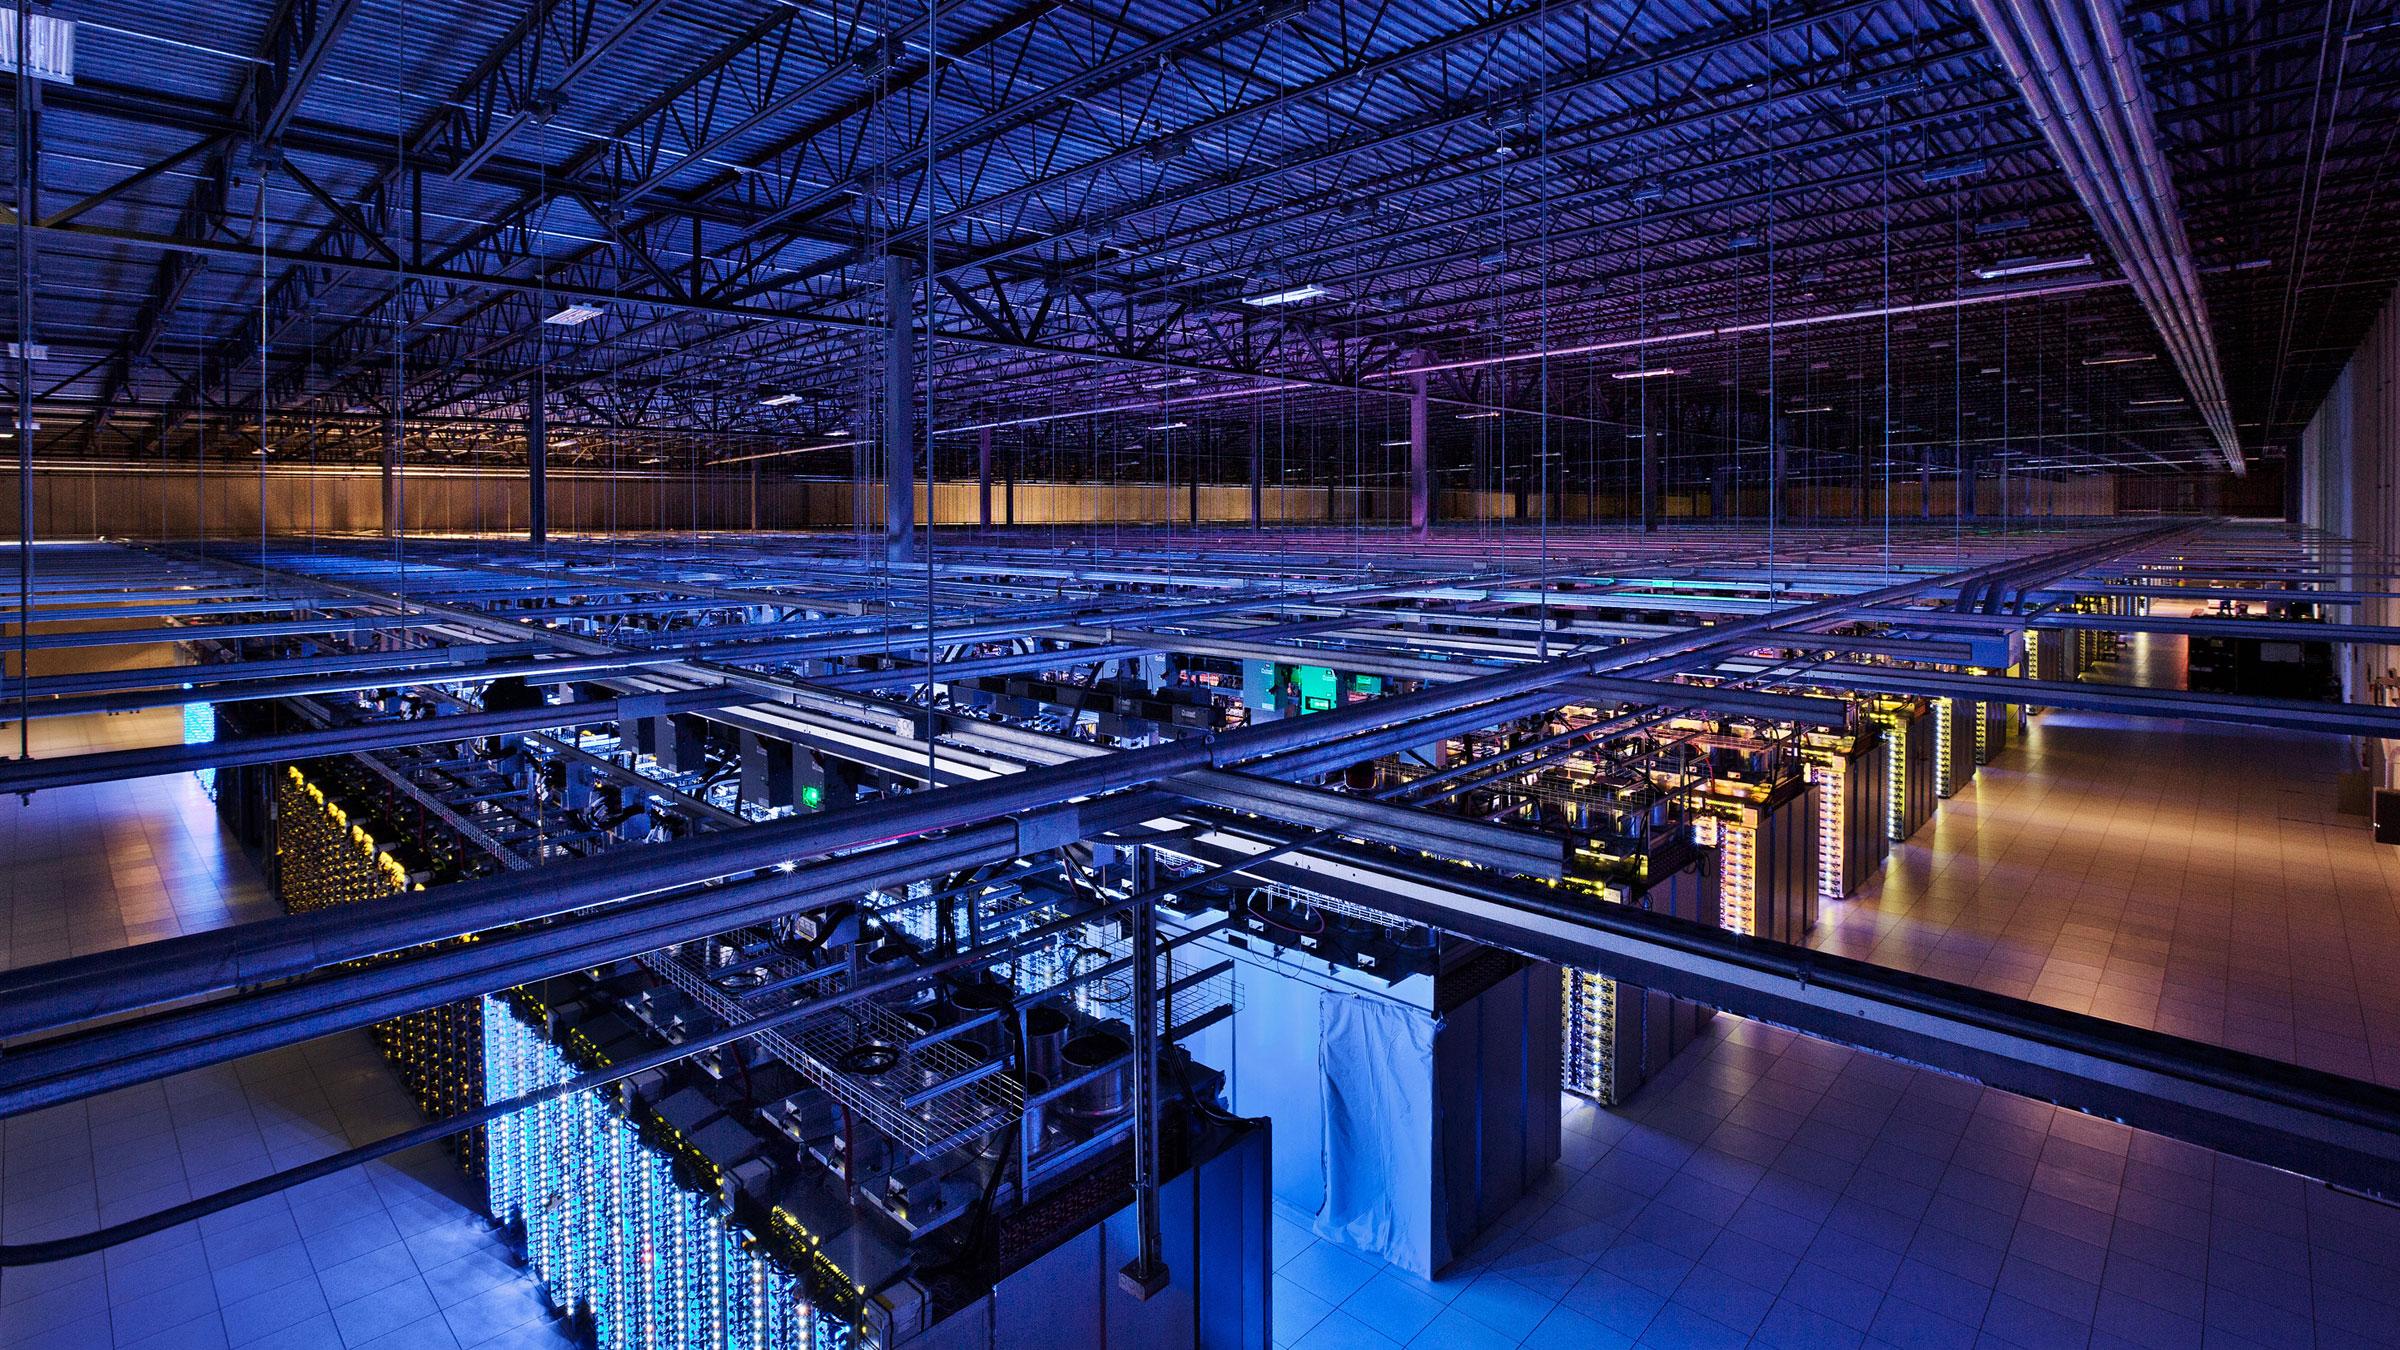 Google Data Center Blue